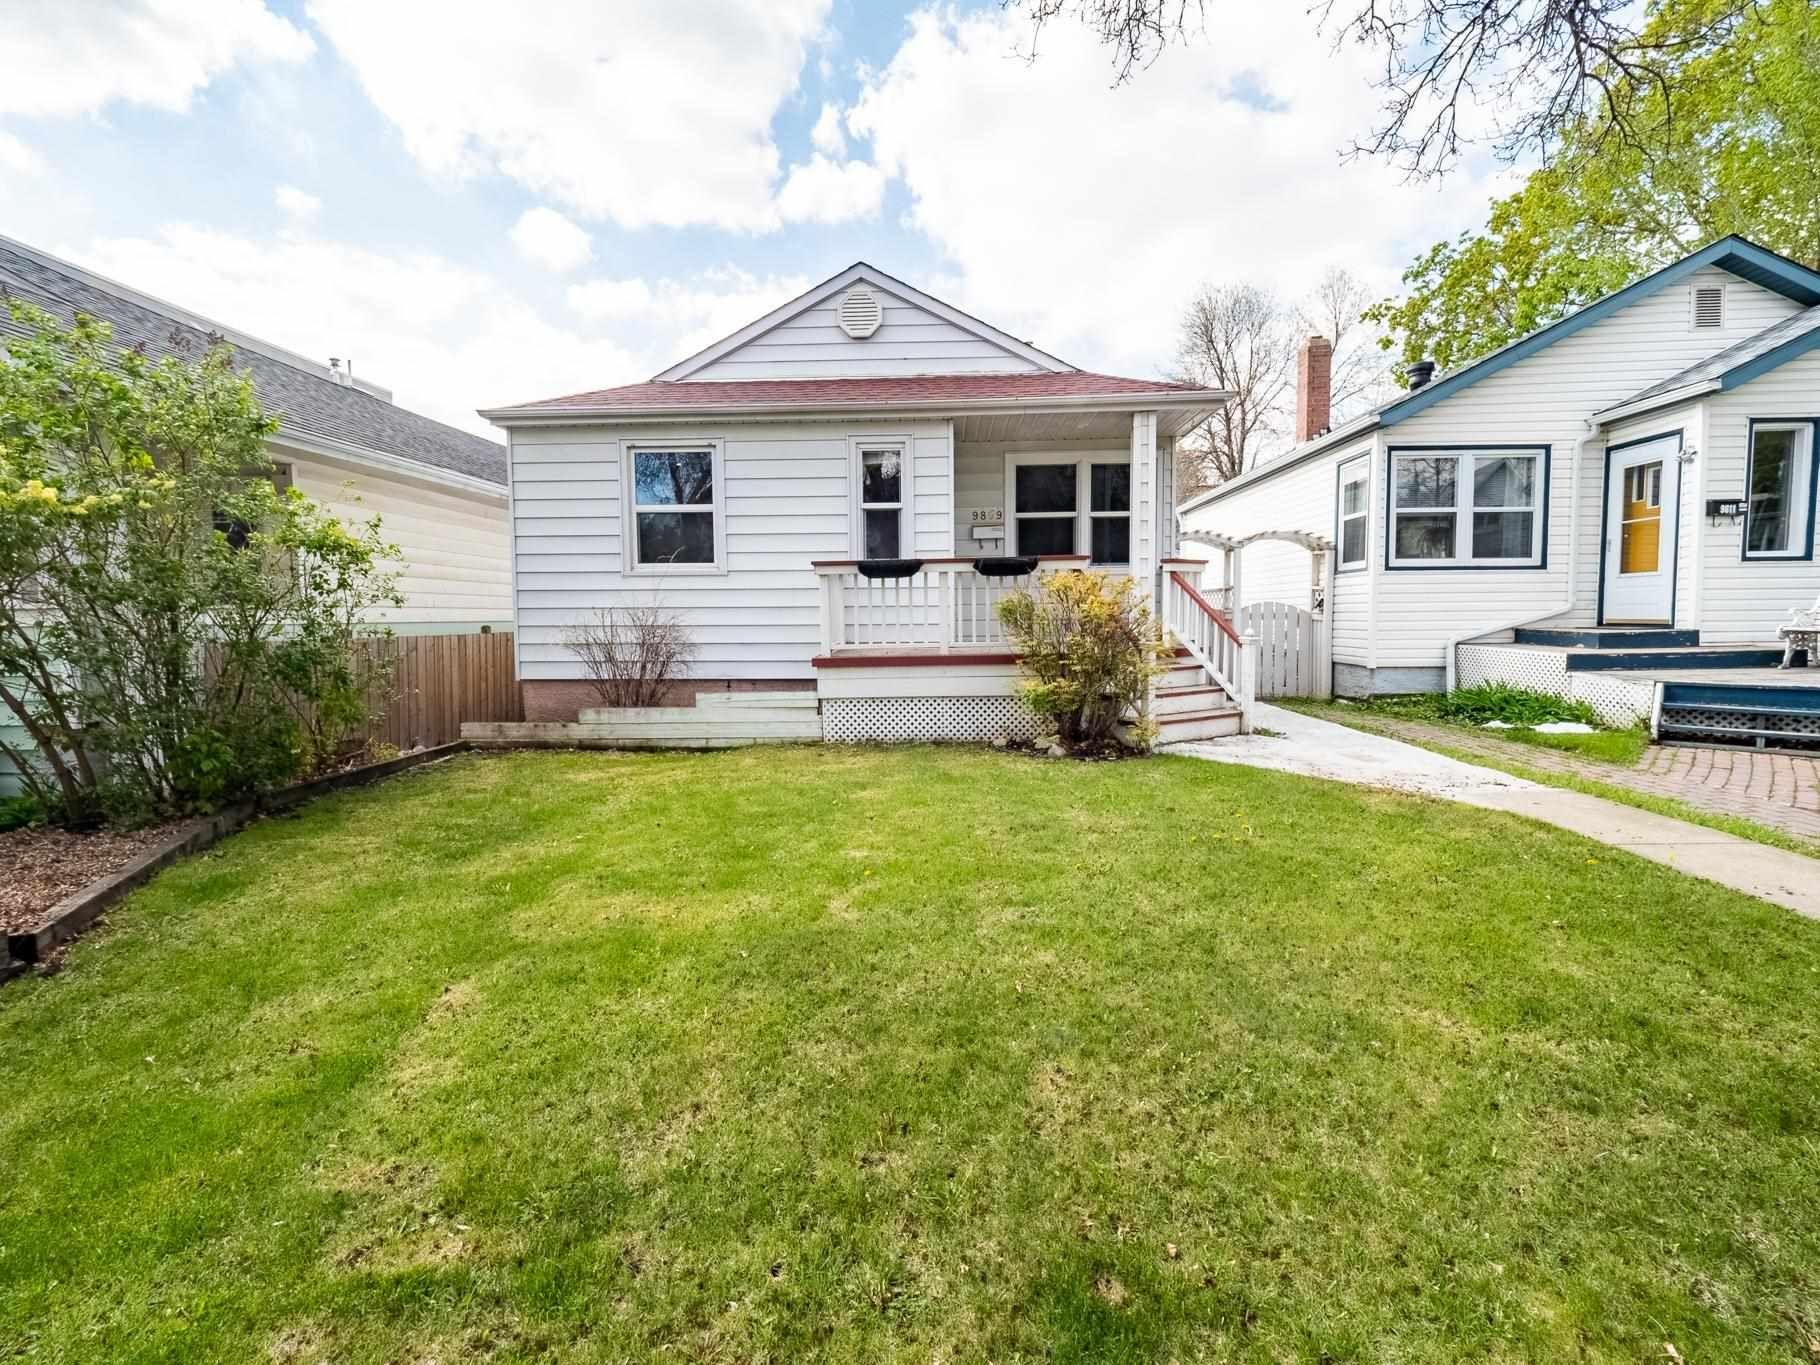 Main Photo: 9809 83 Avenue in Edmonton: Zone 15 House for sale : MLS®# E4242308